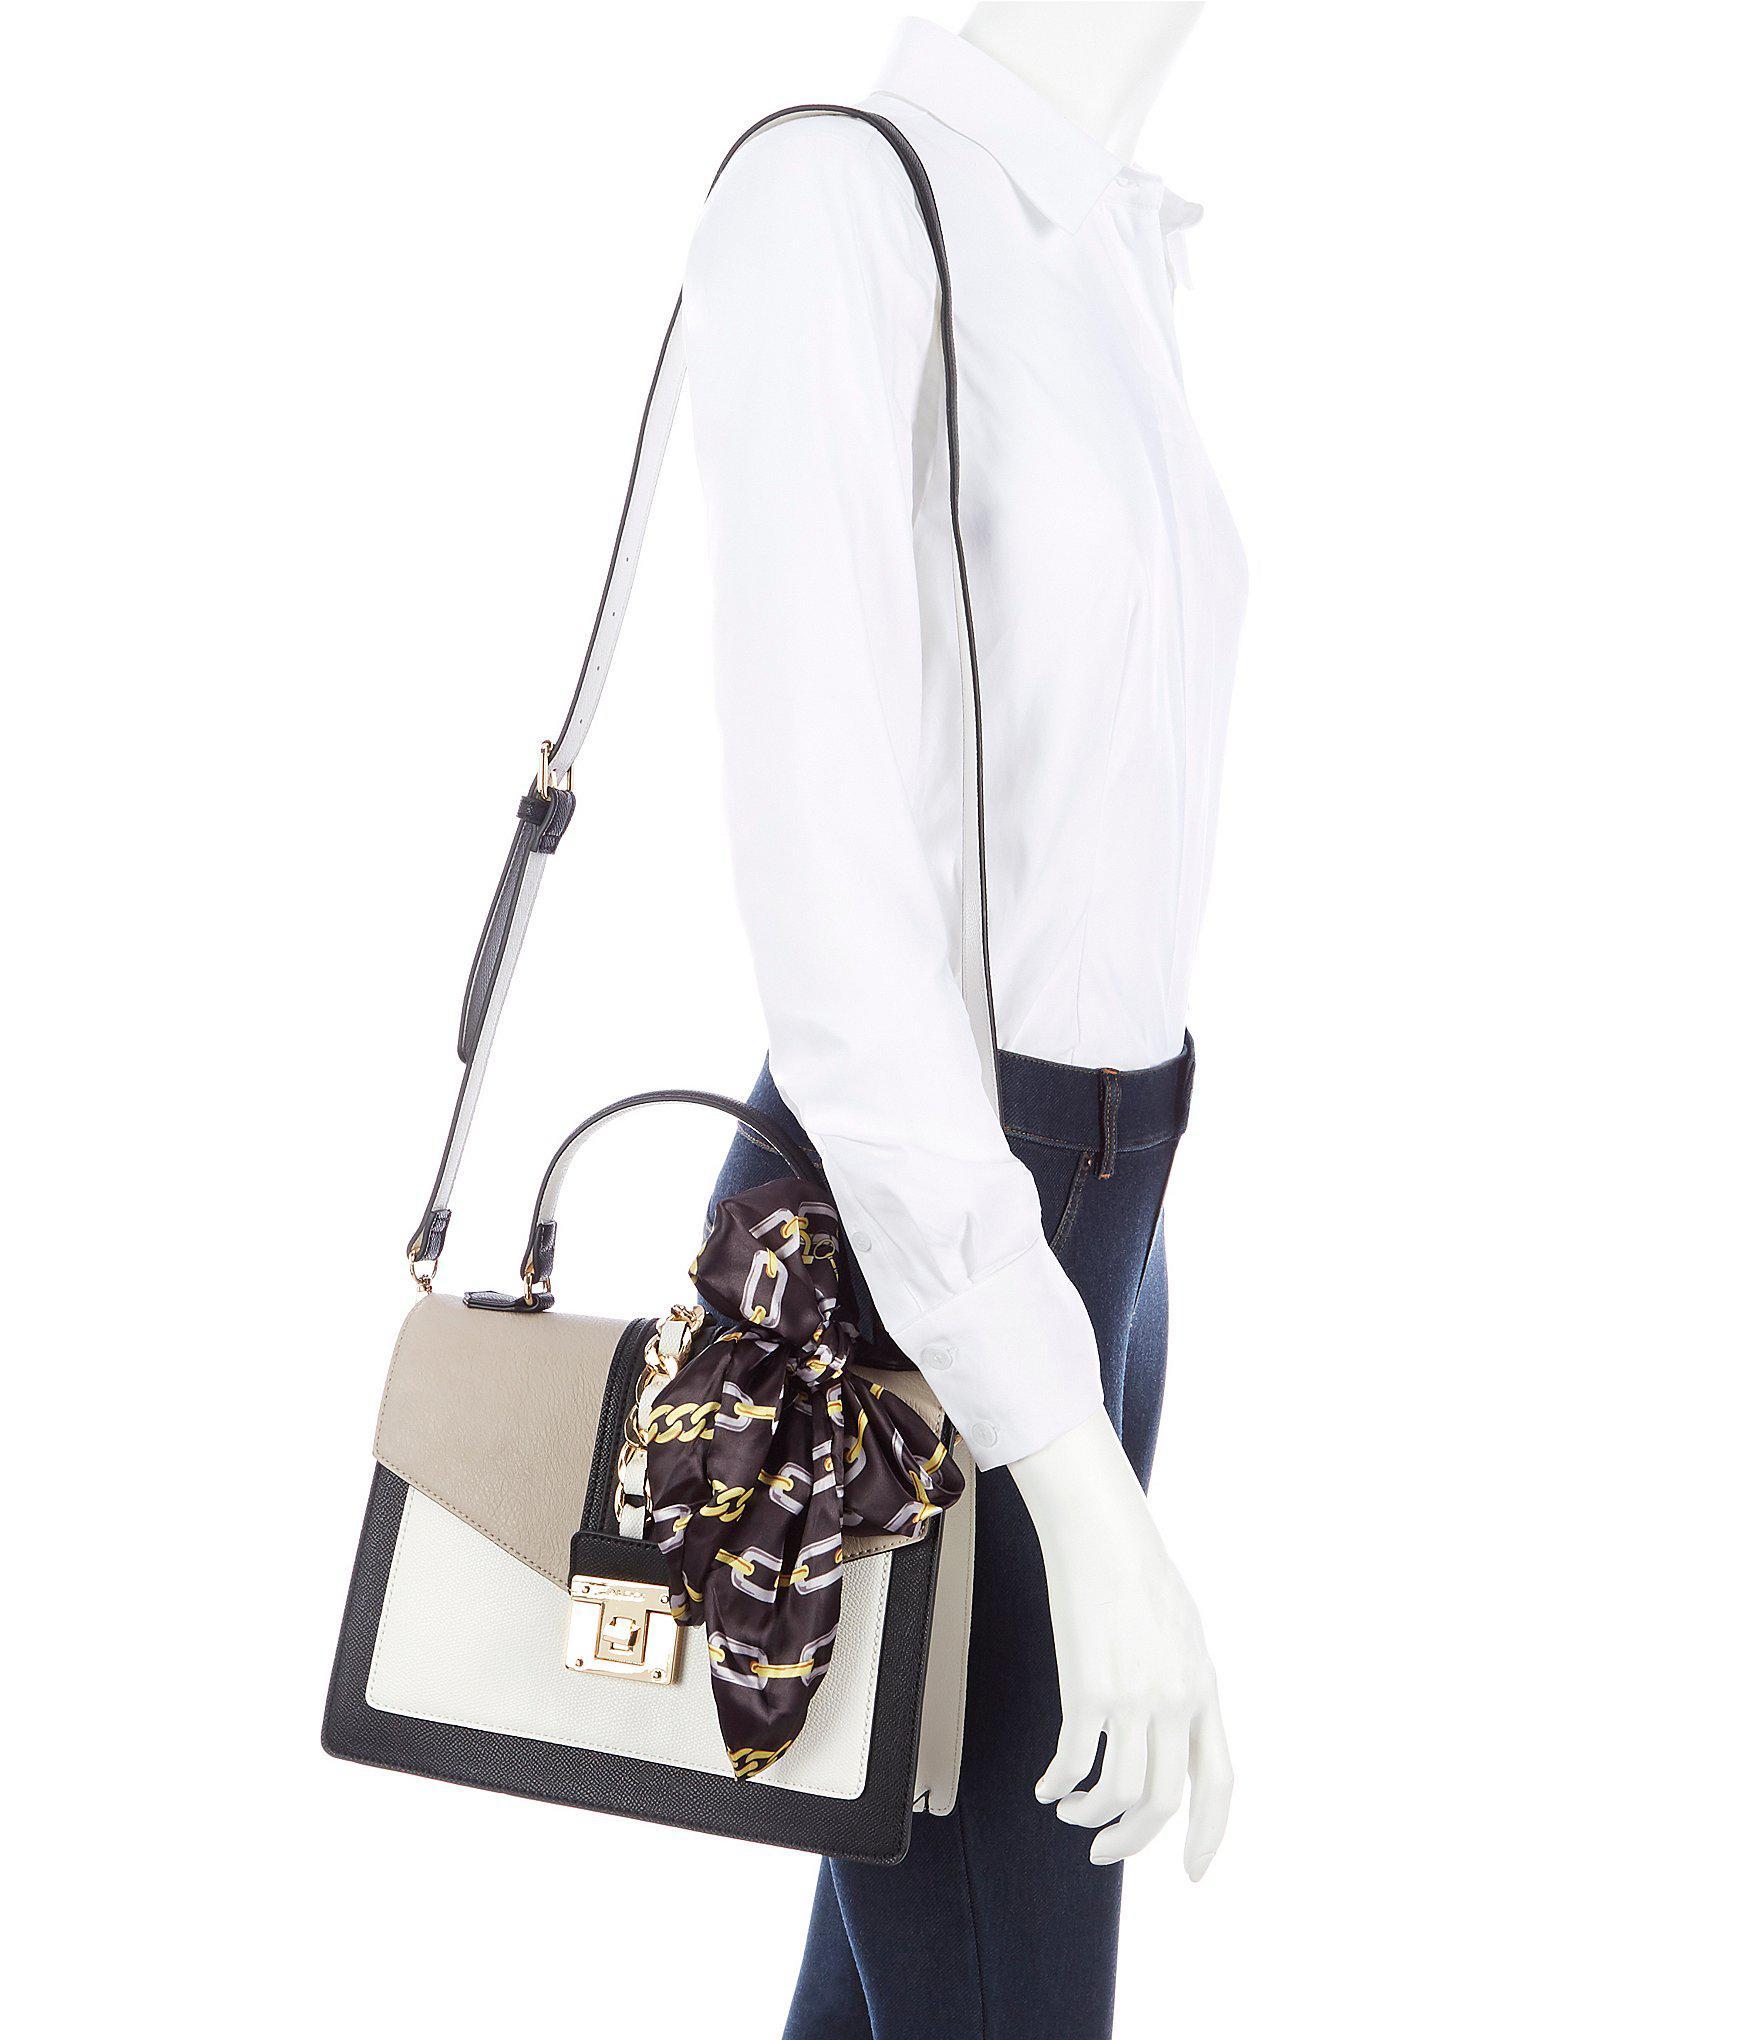 226e1fc439 Lyst - ALDO Glendaa Small Top Handle Taupe Colorblock Handbag